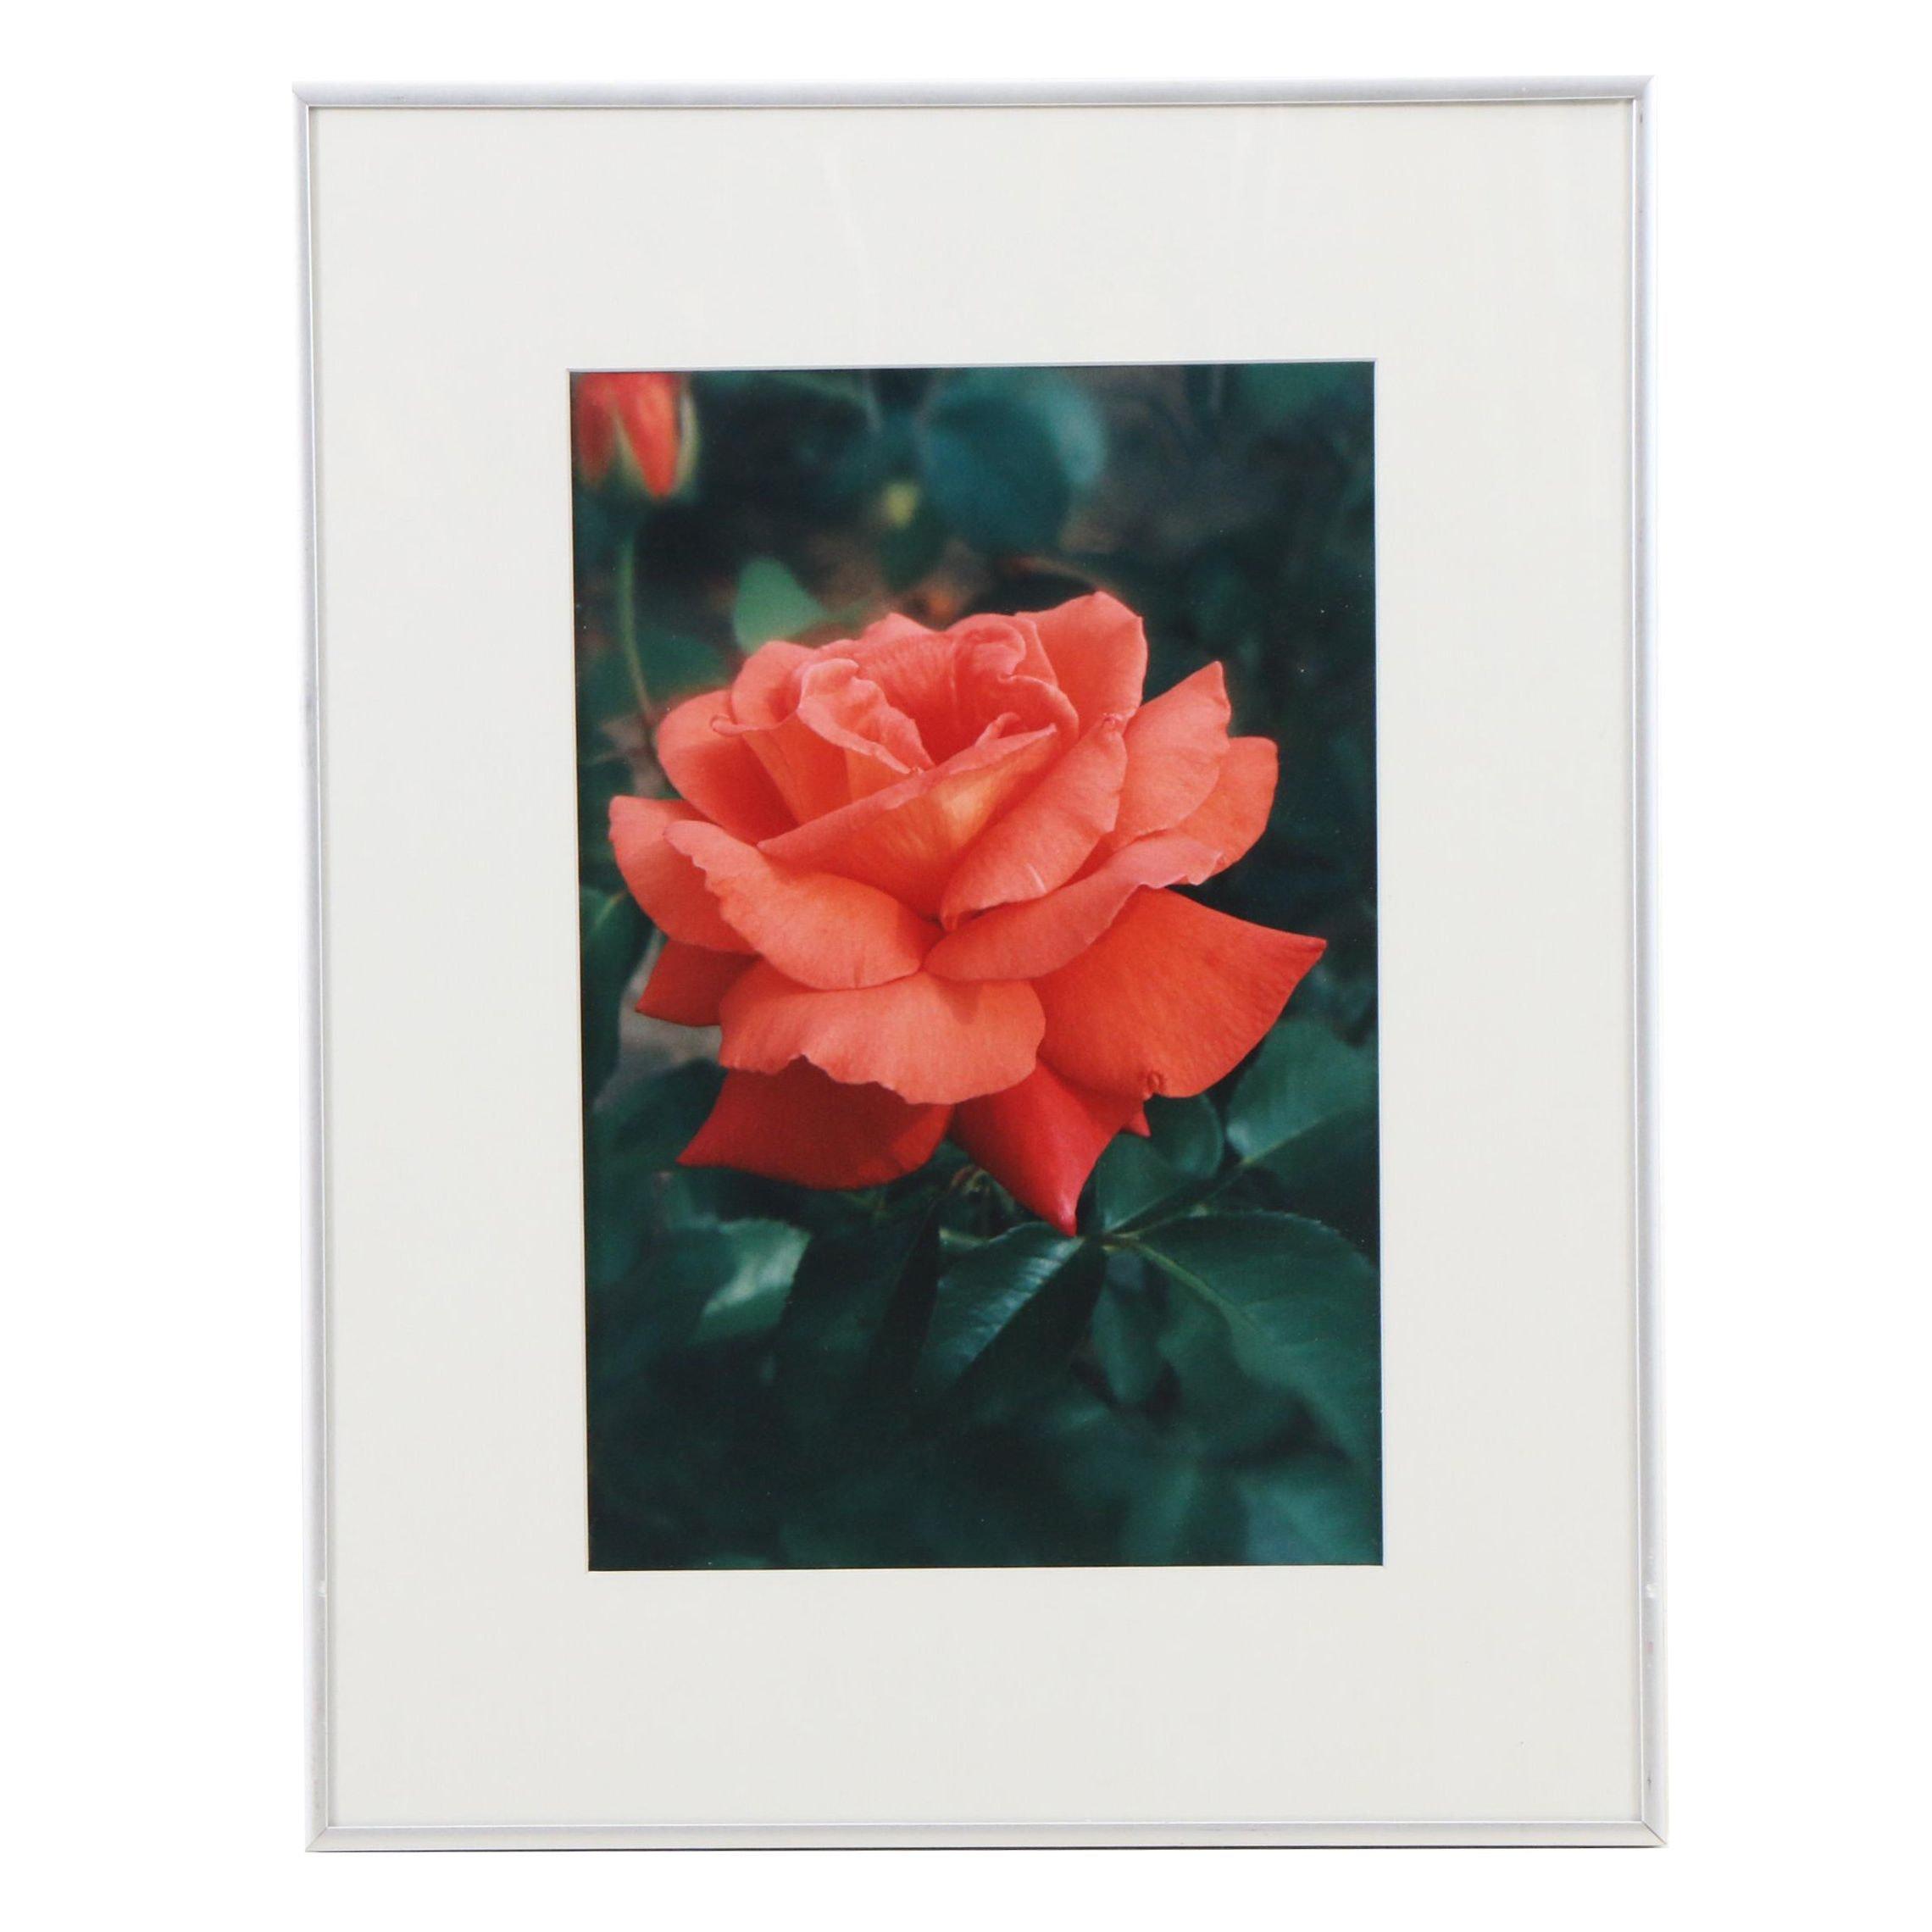 Louis Papp Salmon Rose Photographic Print